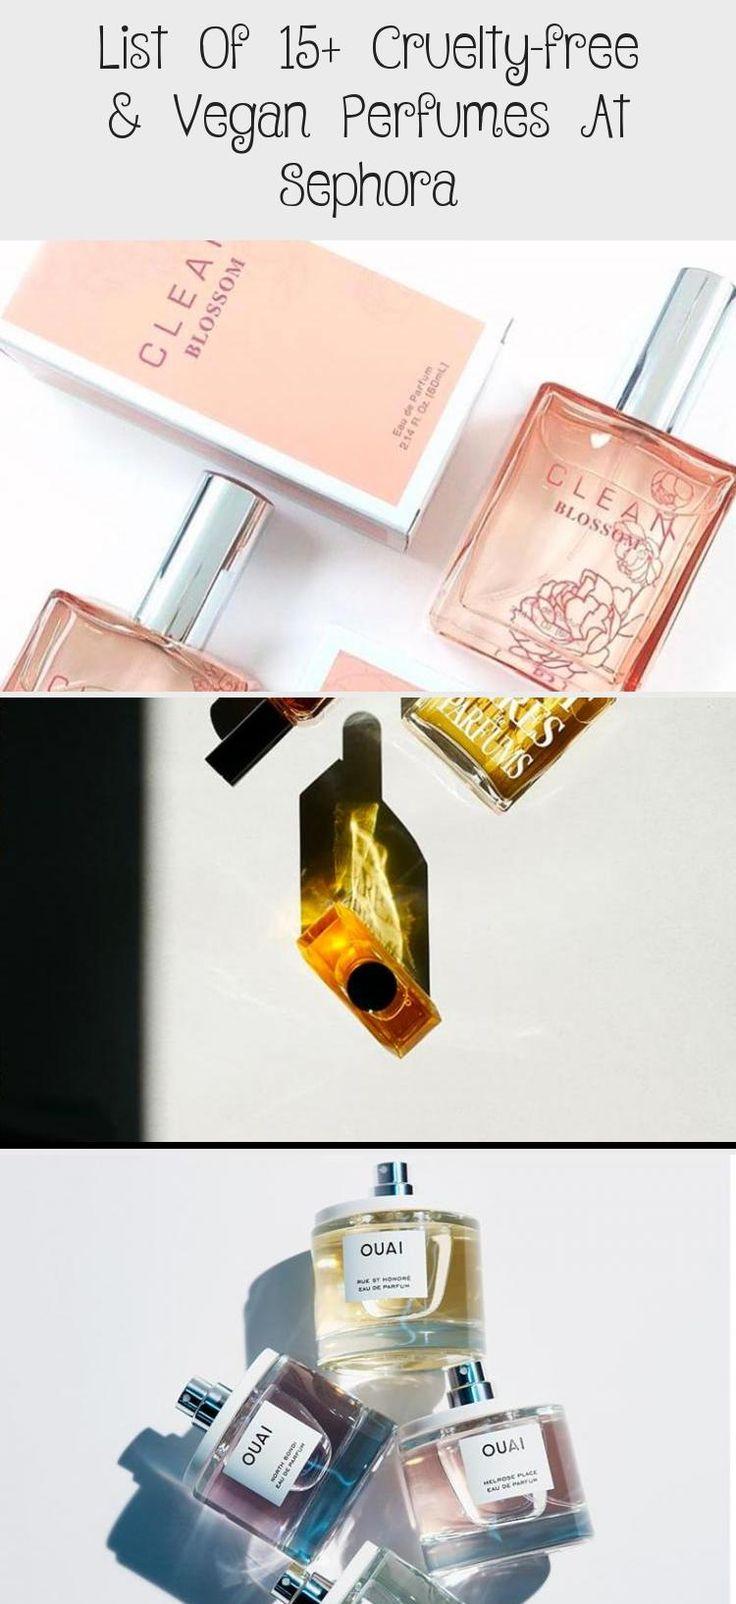 List Of 15+ Crueltyfree & Vegan Perfumes At Sephora